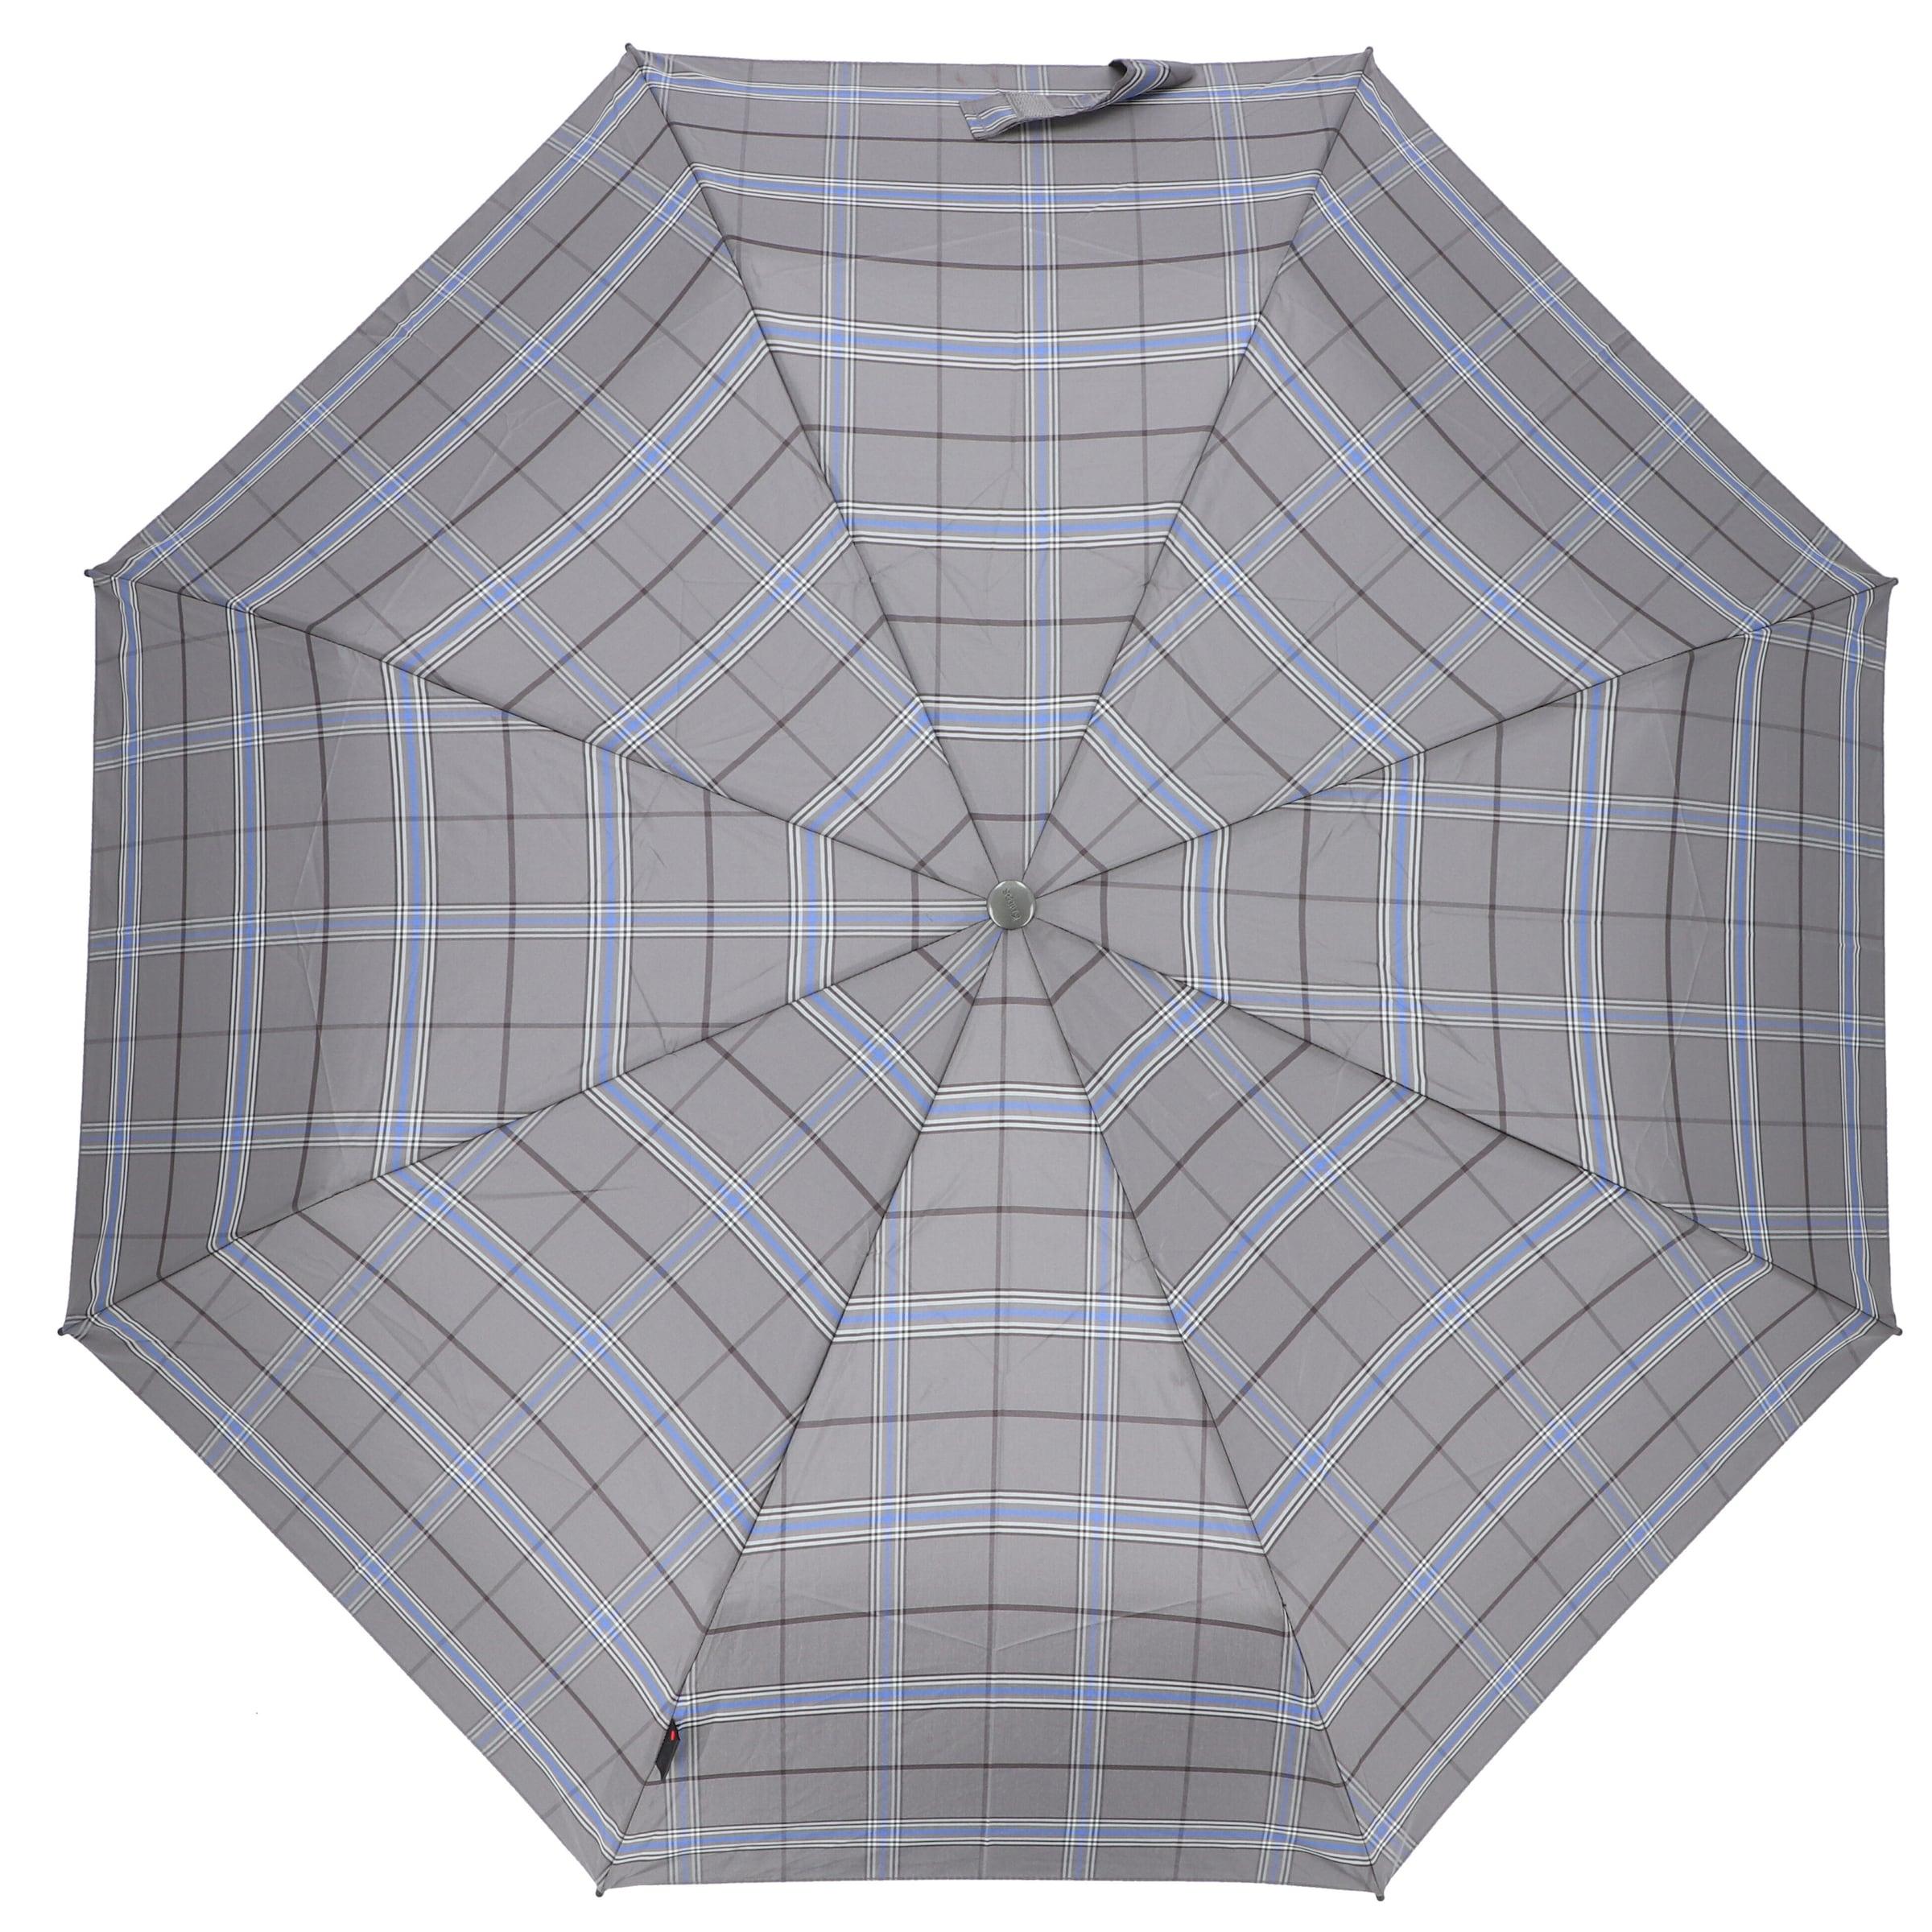 200 Parapluie Medium Duomatic' 't BleuGris Blanc Knirps En g7Yfyb6